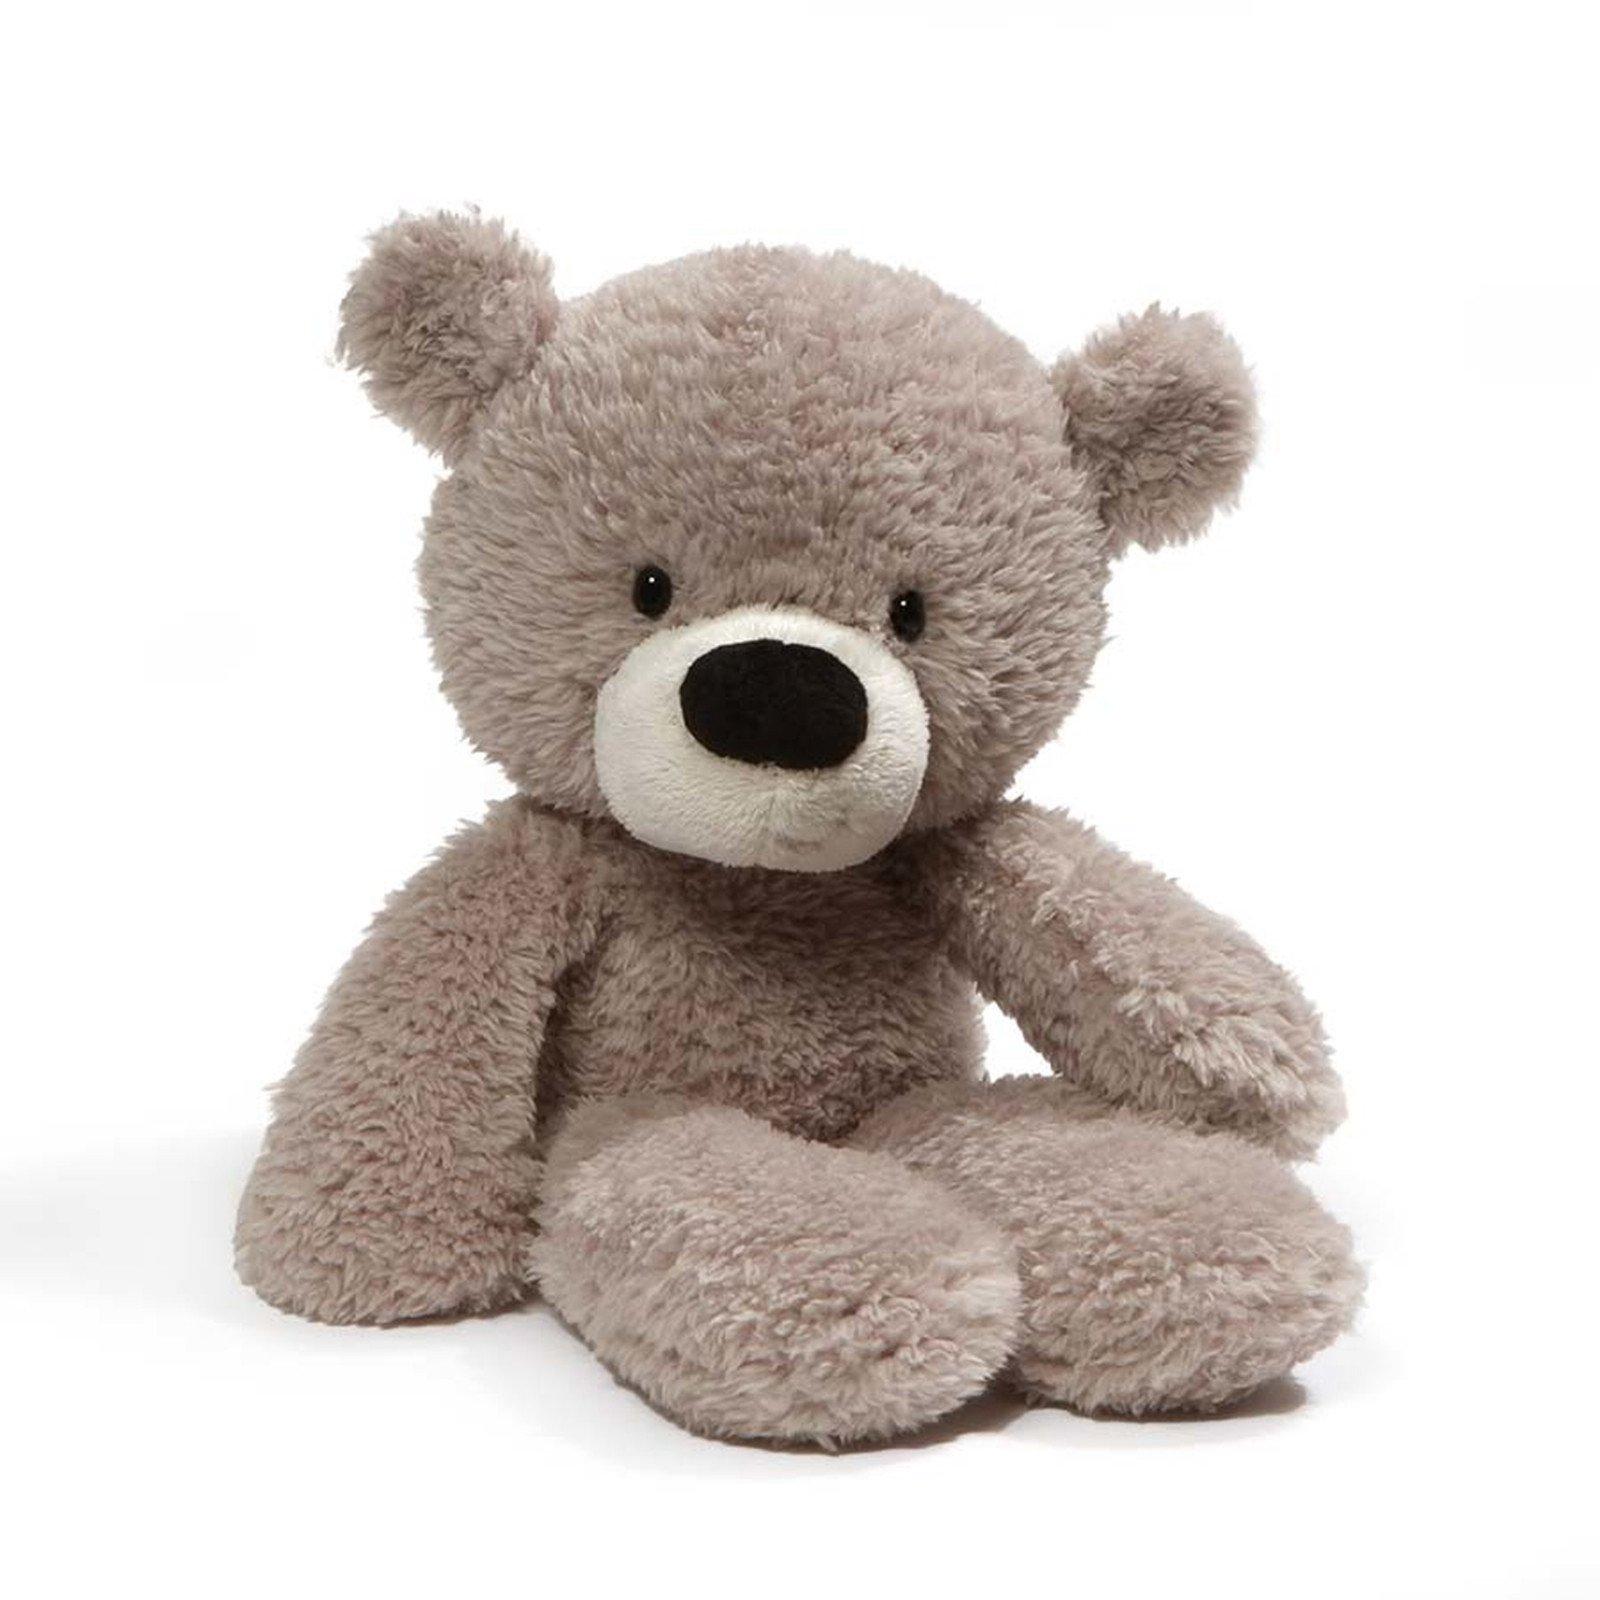 Perhatikan Bentuk dan Keamanan Mainan - Tips-Tips yang Perlu Diperhatikan dalam Memilih Mainan Anak Perempuan